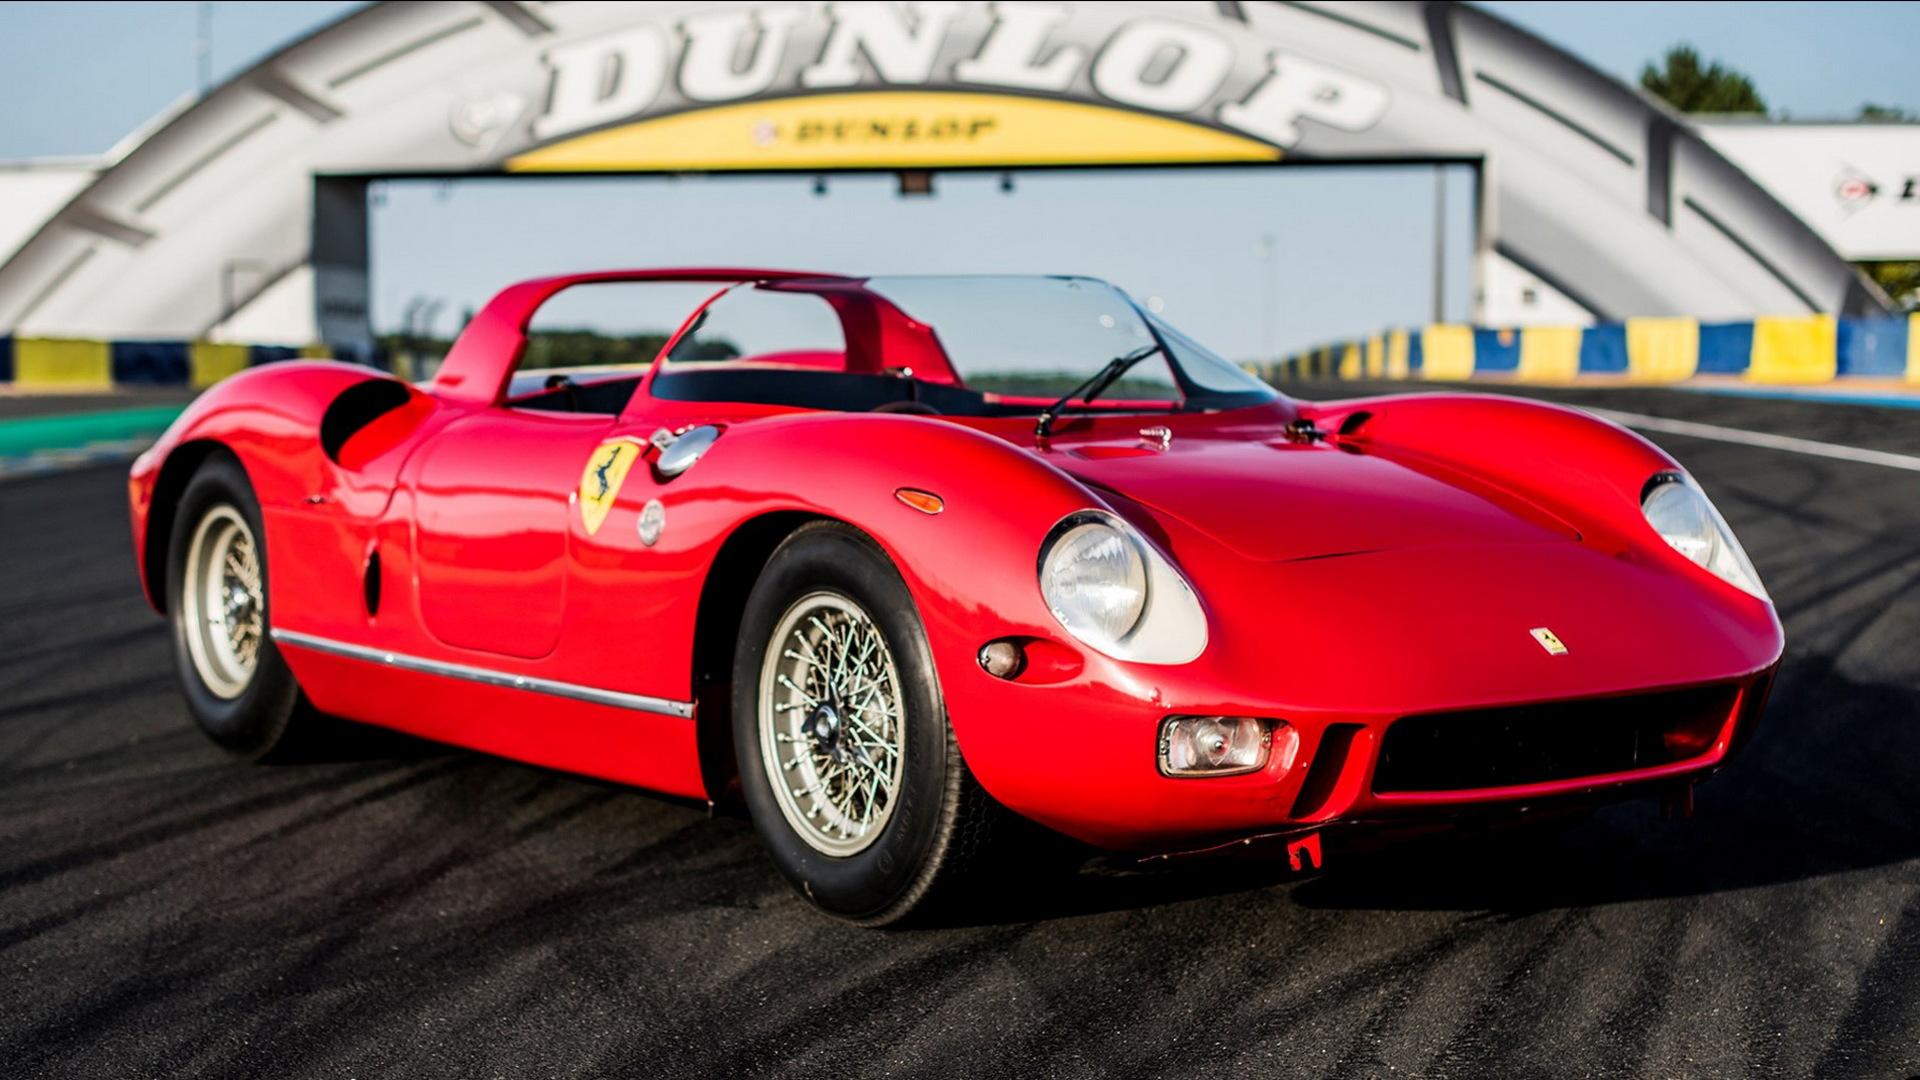 1963 Ferrari 275 P chassis No. 0816 - Image via RM Sotheby's